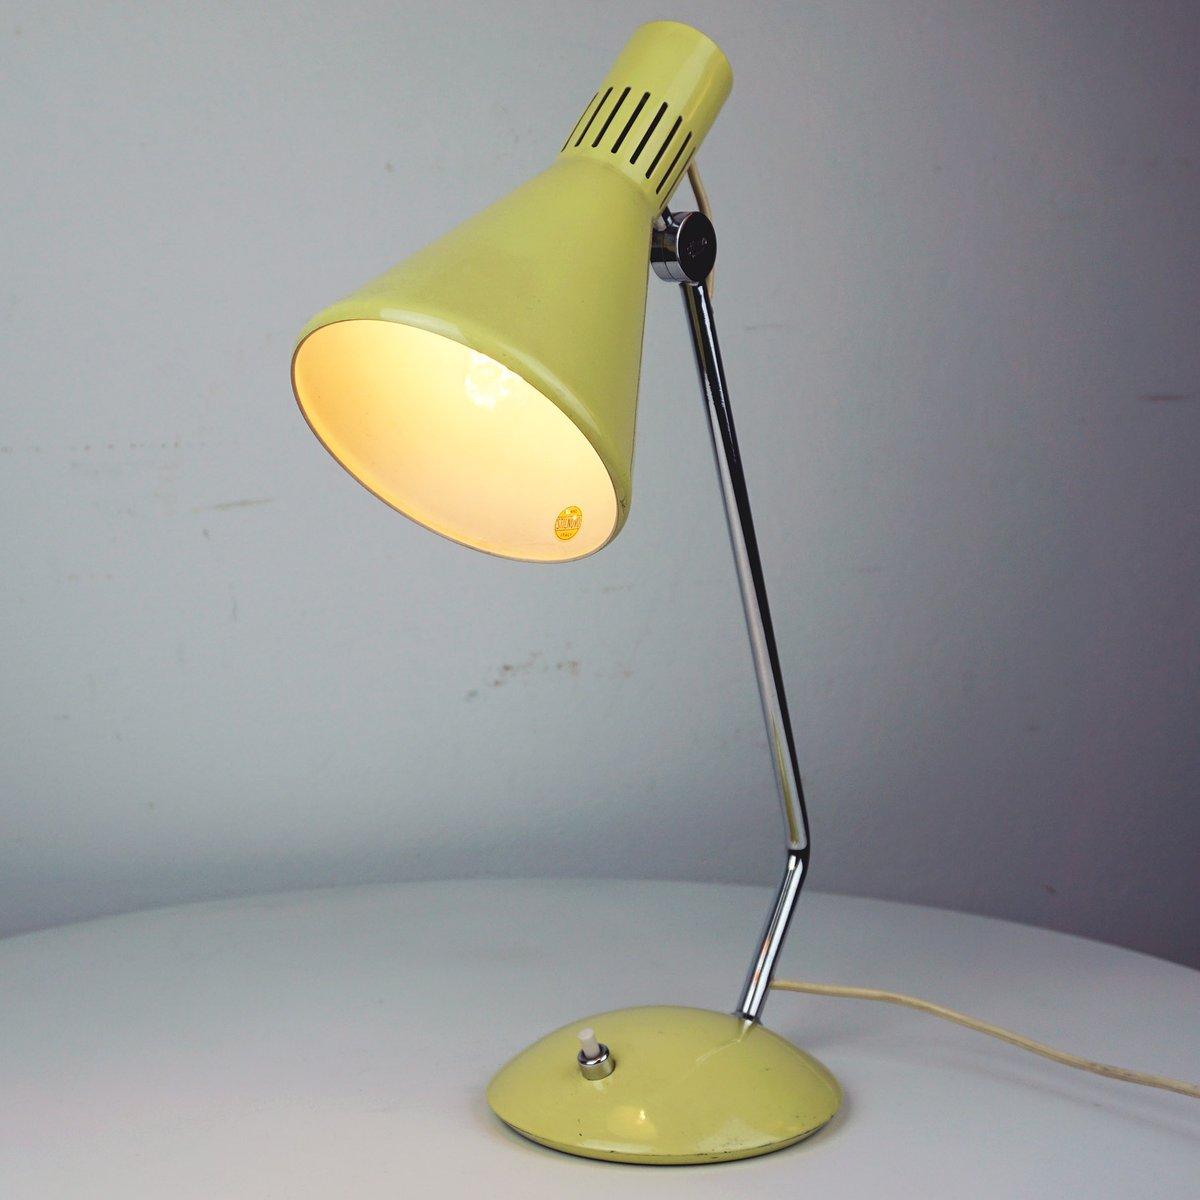 lampe de bureau mid century jaune de stilnovo italie en vente sur pamono. Black Bedroom Furniture Sets. Home Design Ideas